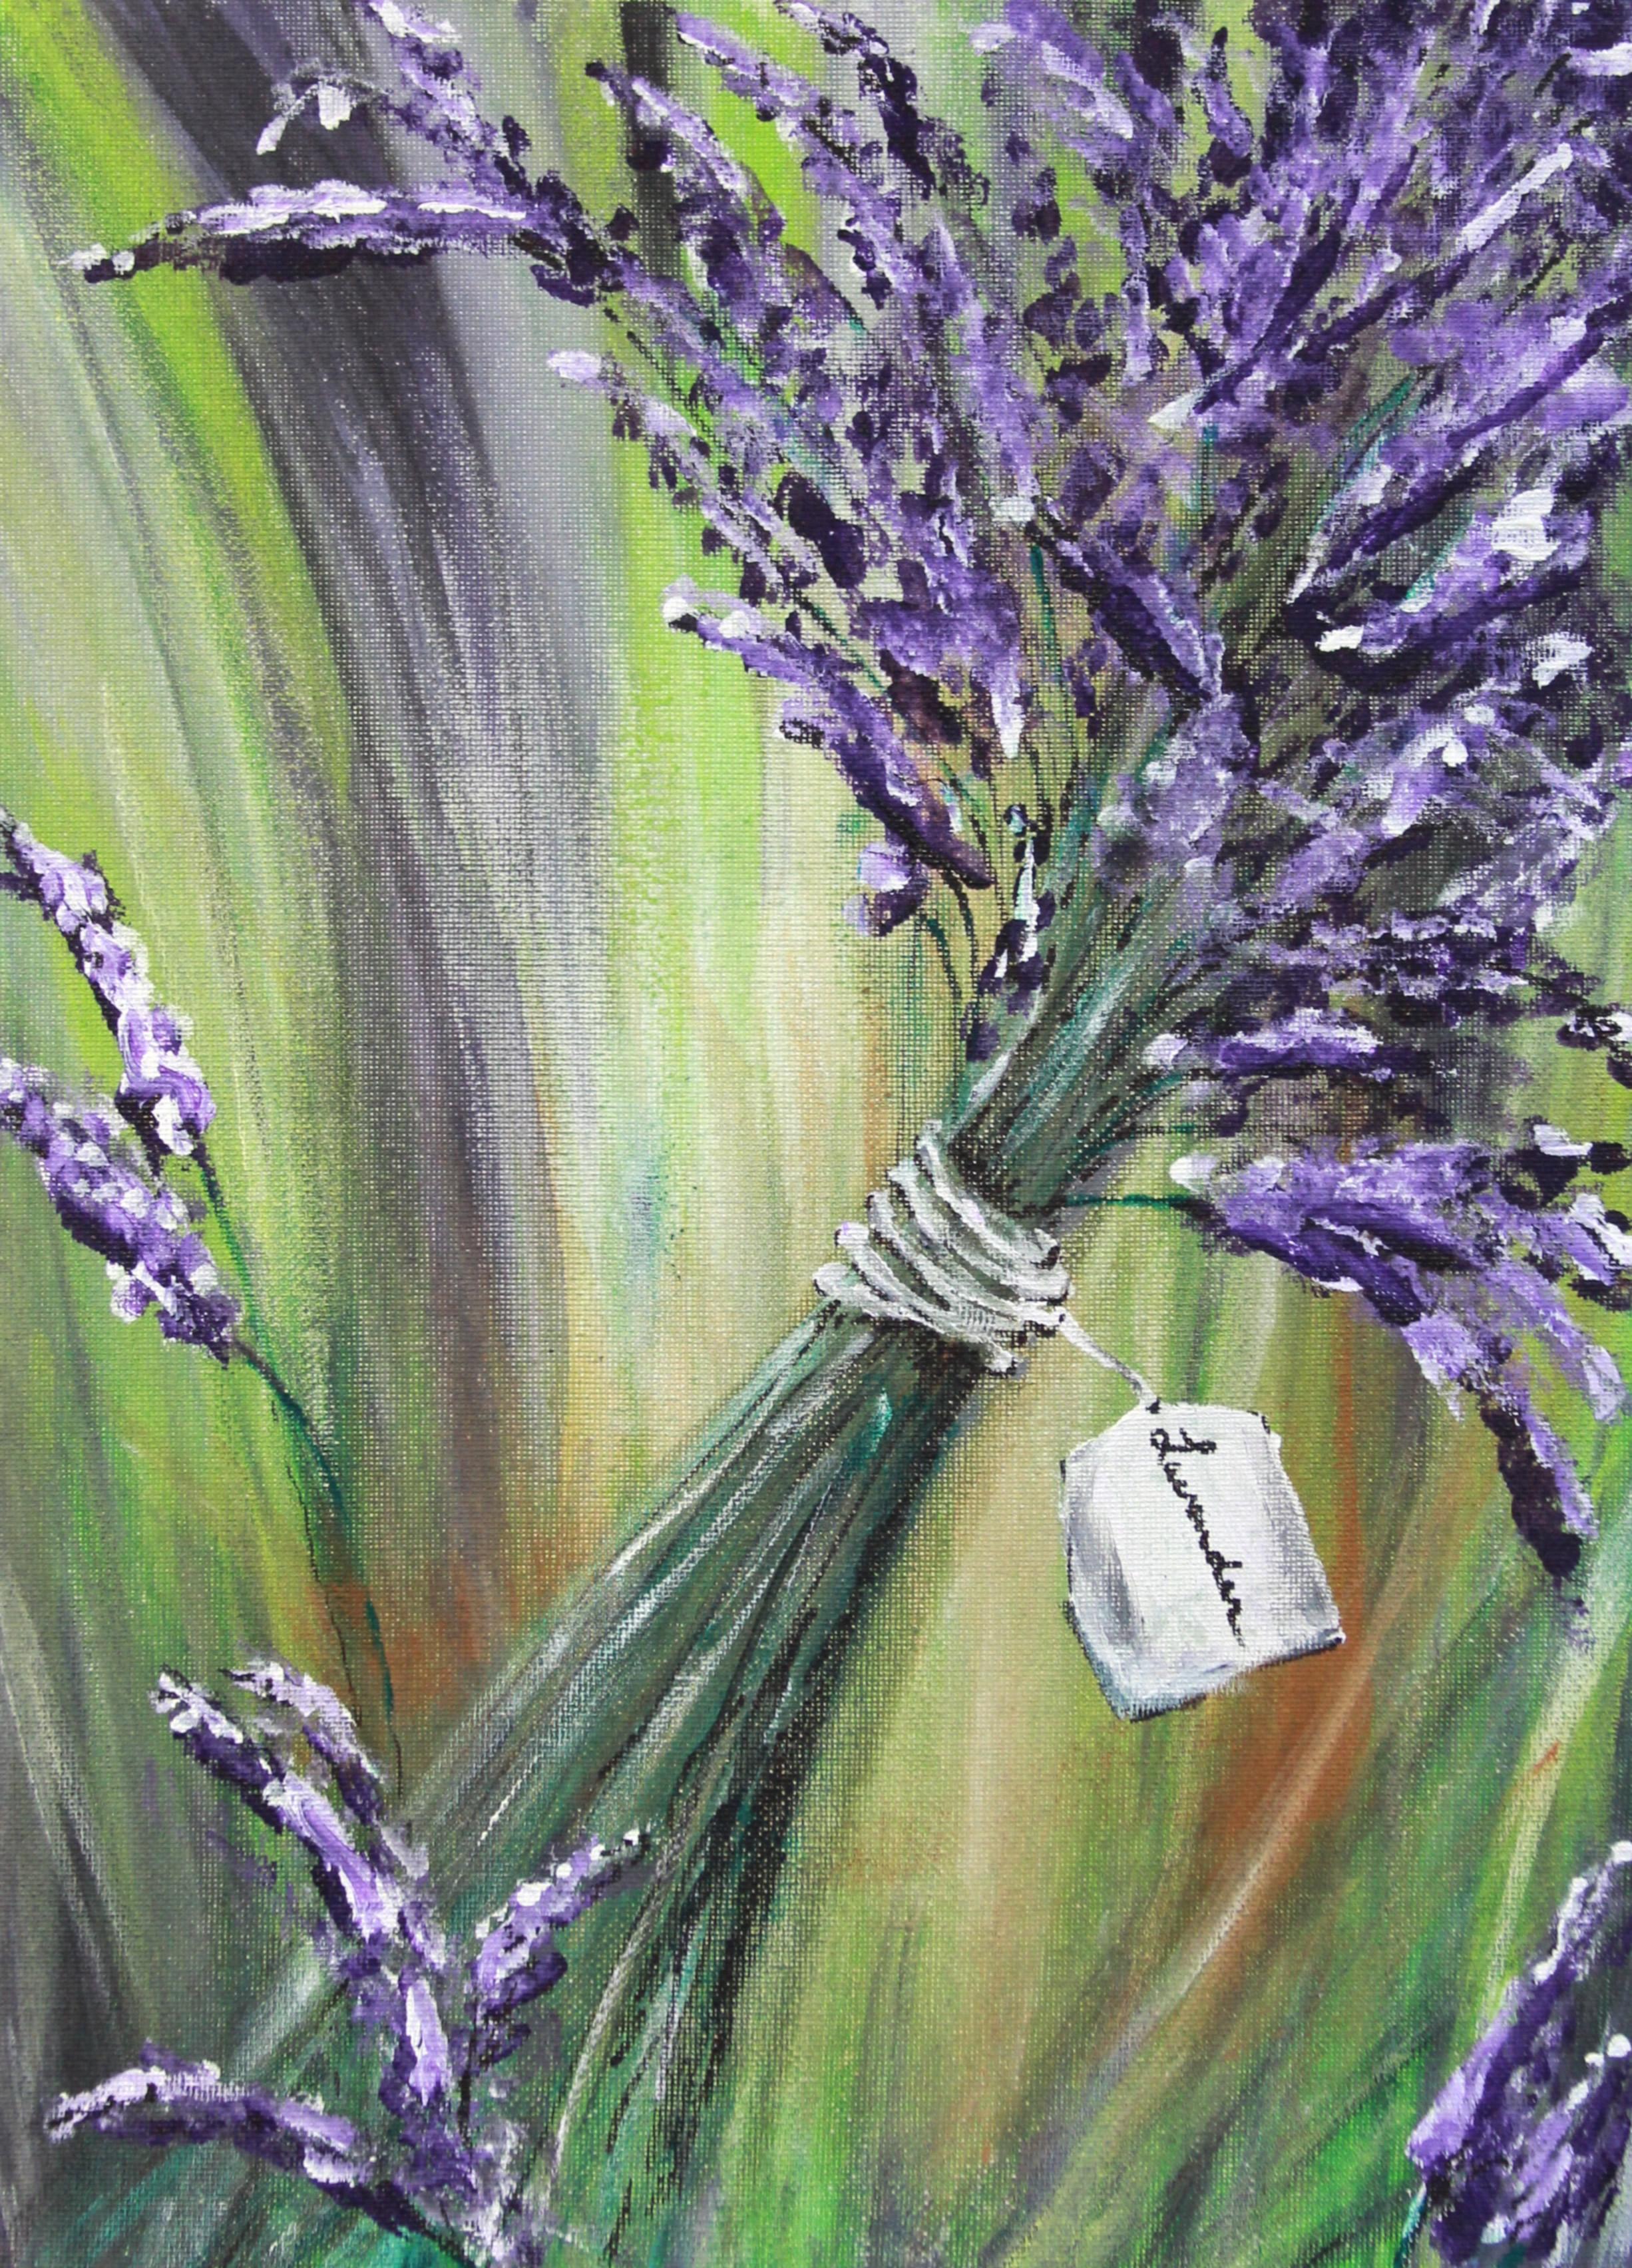 11) Lavender